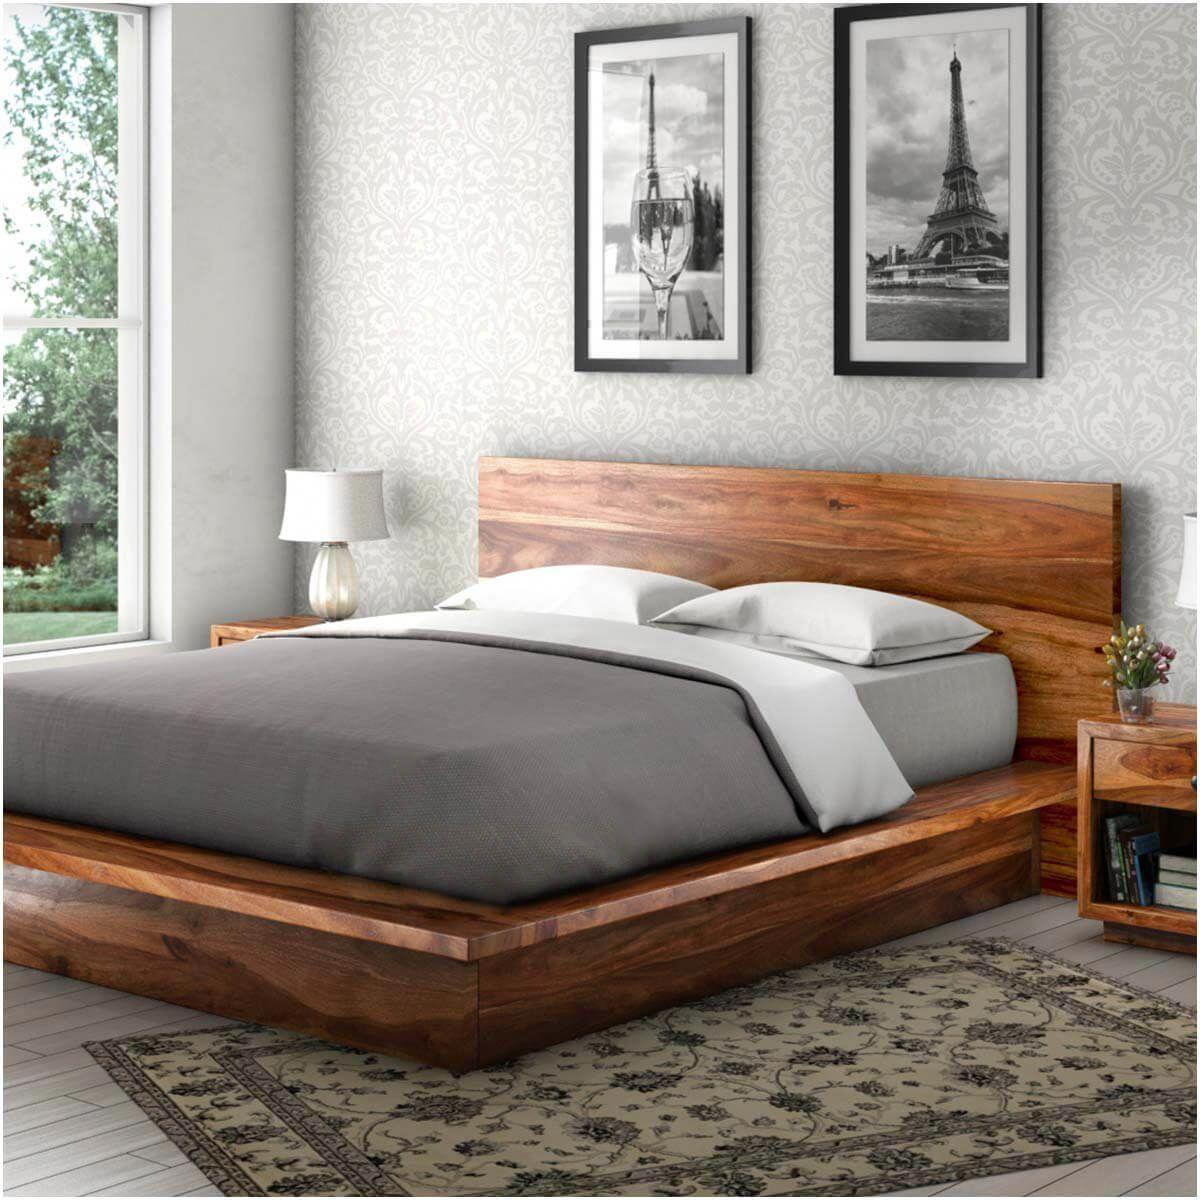 Second Hand Bed Sheets For Sale Luxurybeddingcomforter Id 5625161113 Coolbeddingsets Platform Bed Designs Solid Wood Bed Frame Solid Wood Platform Bed